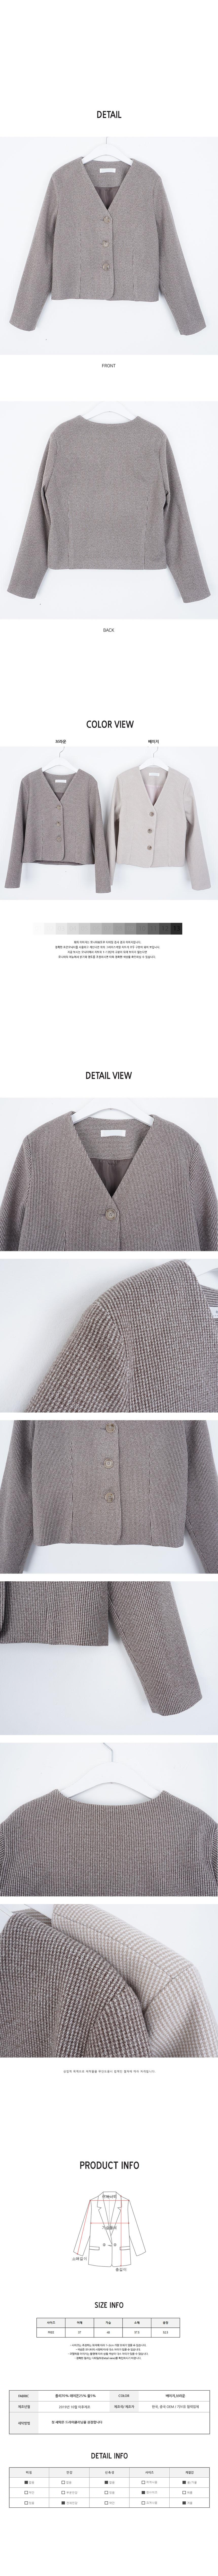 Ale check wool jacket